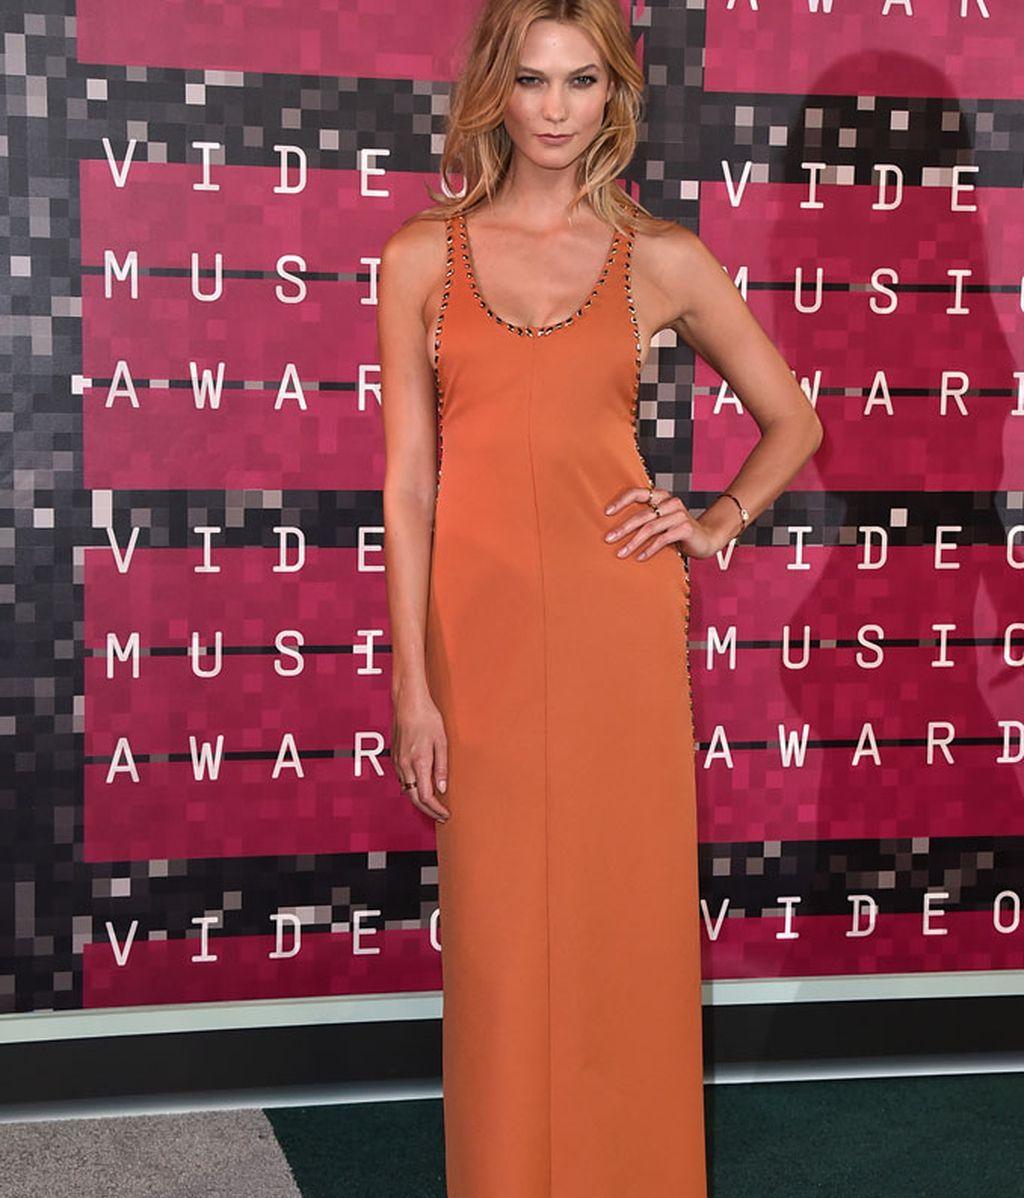 Karlie Kloss de Louis Vuitton y con sandalia plana